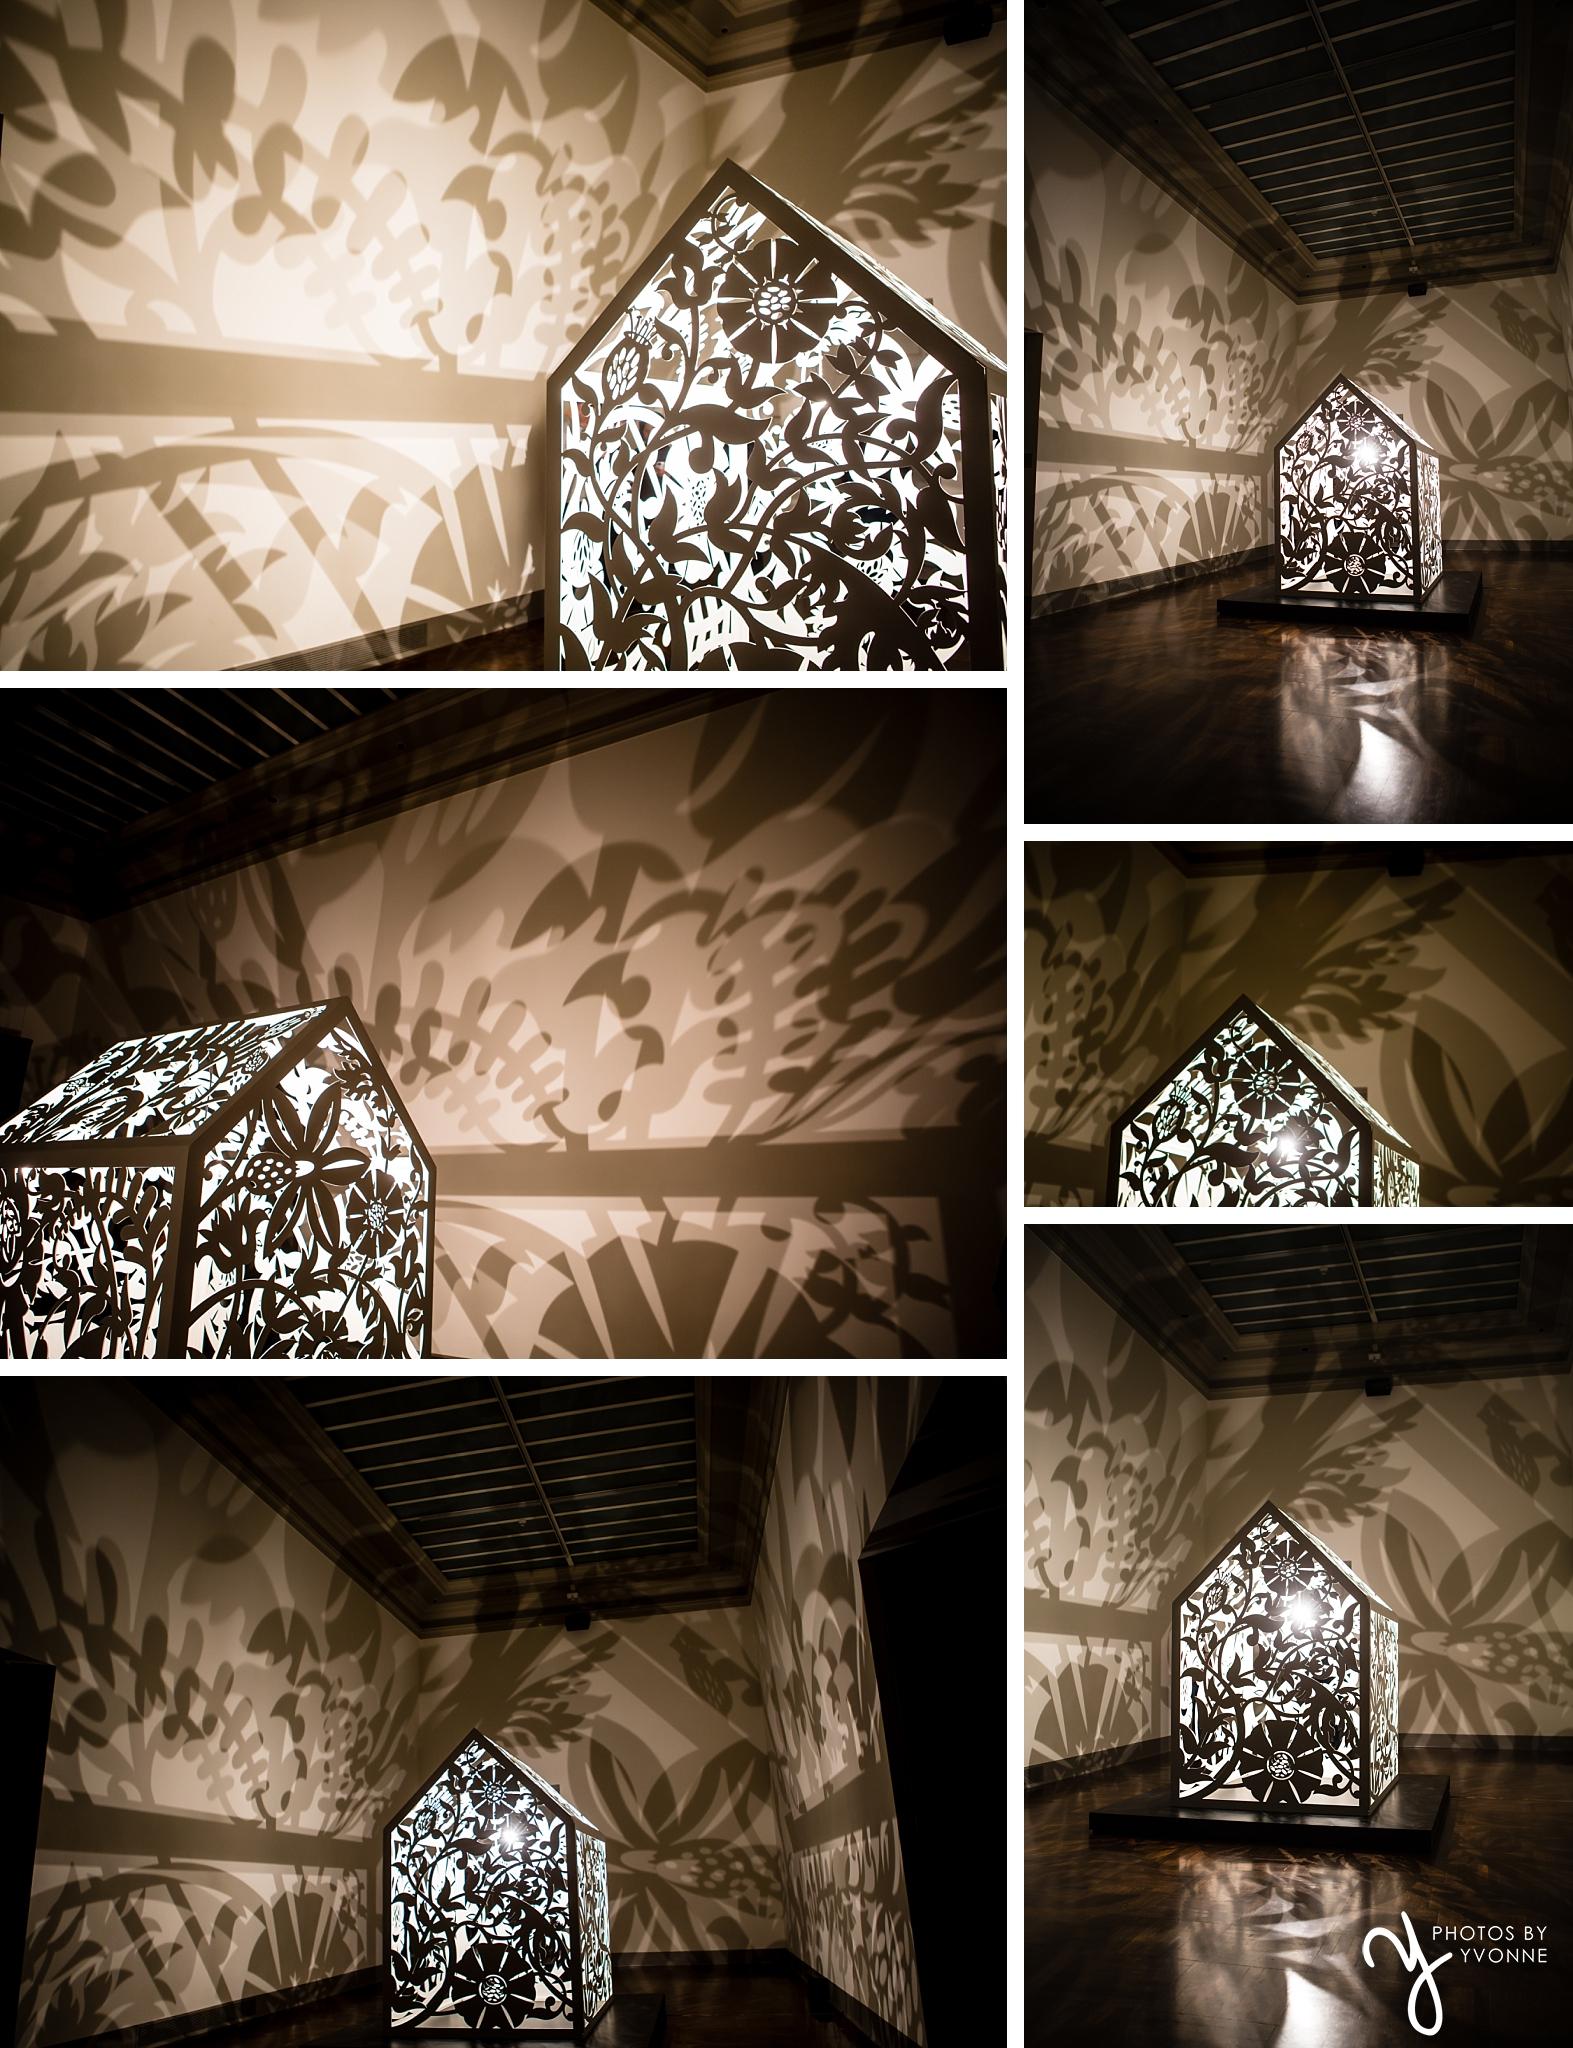 Anila Quayyam Agha: Between Light & Shadow exhibit at The Toledo Museaum of Art